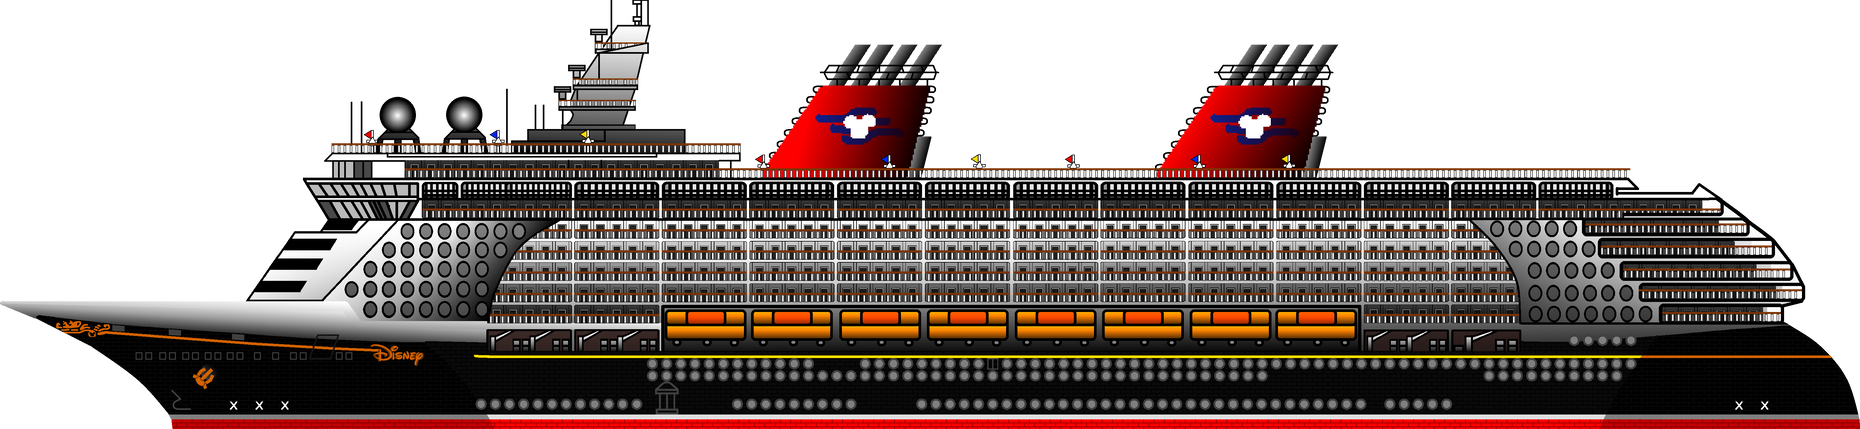 Disney Fantasy Cruise Ship By Ryanh1984 On Deviantart